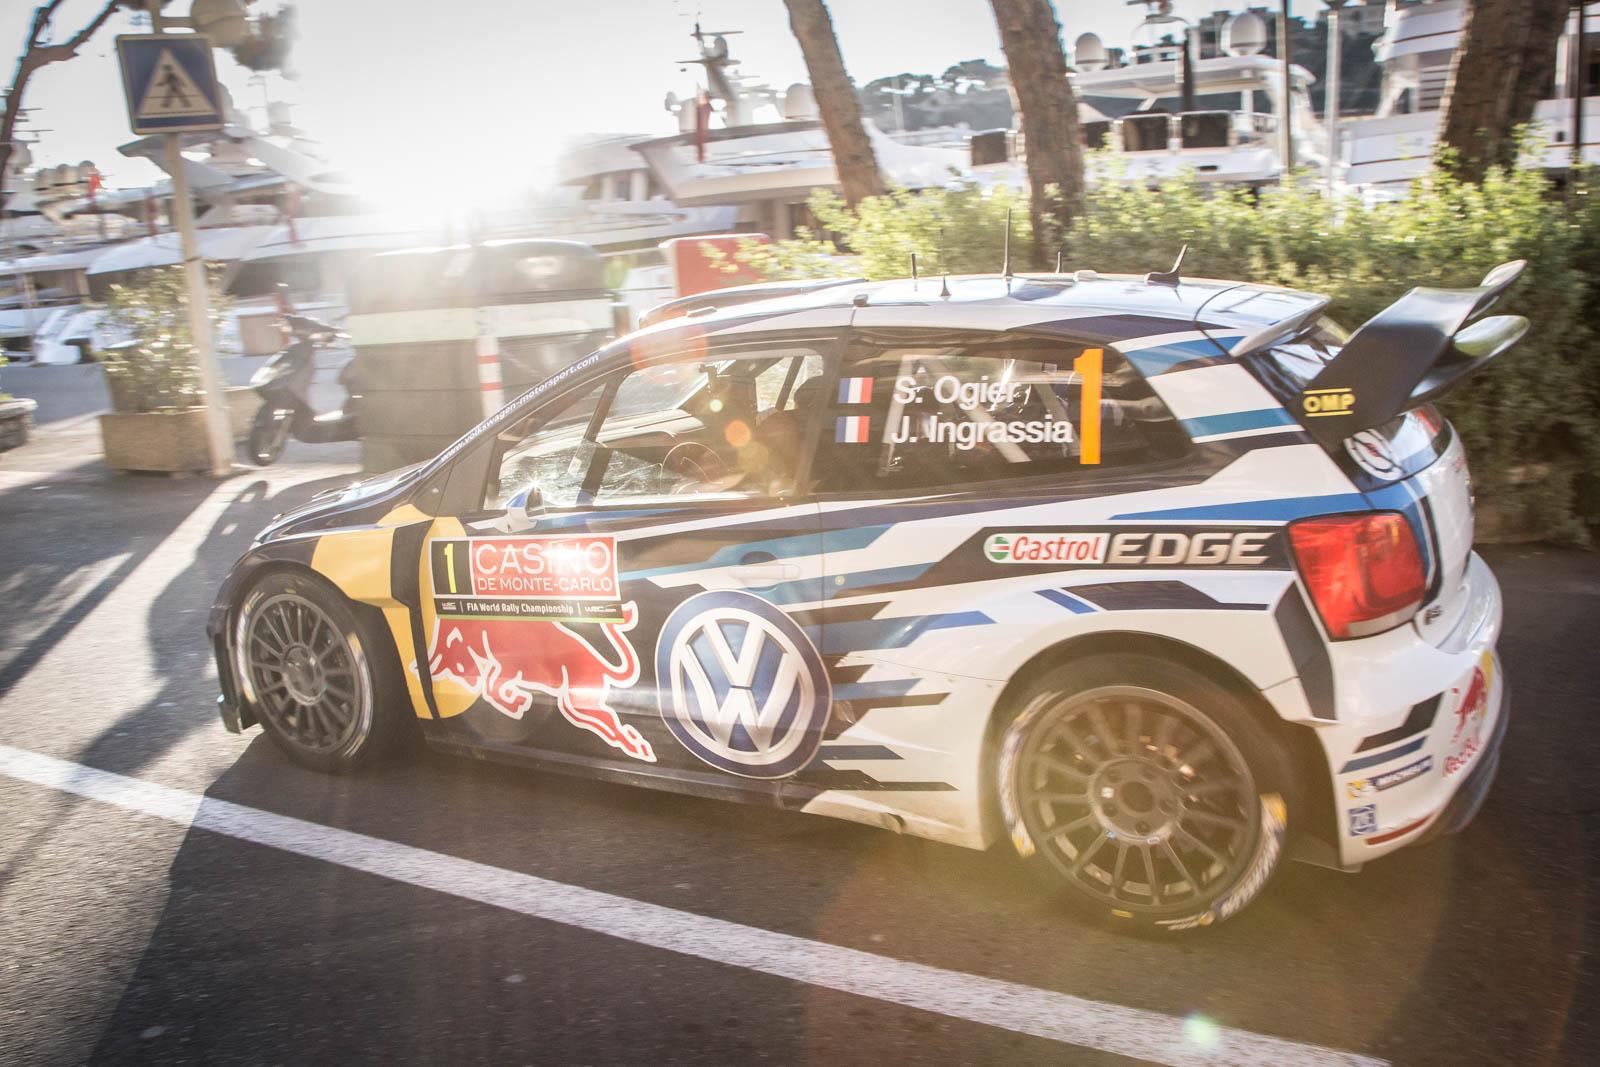 Rally Monte Carlo 2015 - copyright Ivan Blanco Vilar LR-4443.jpg